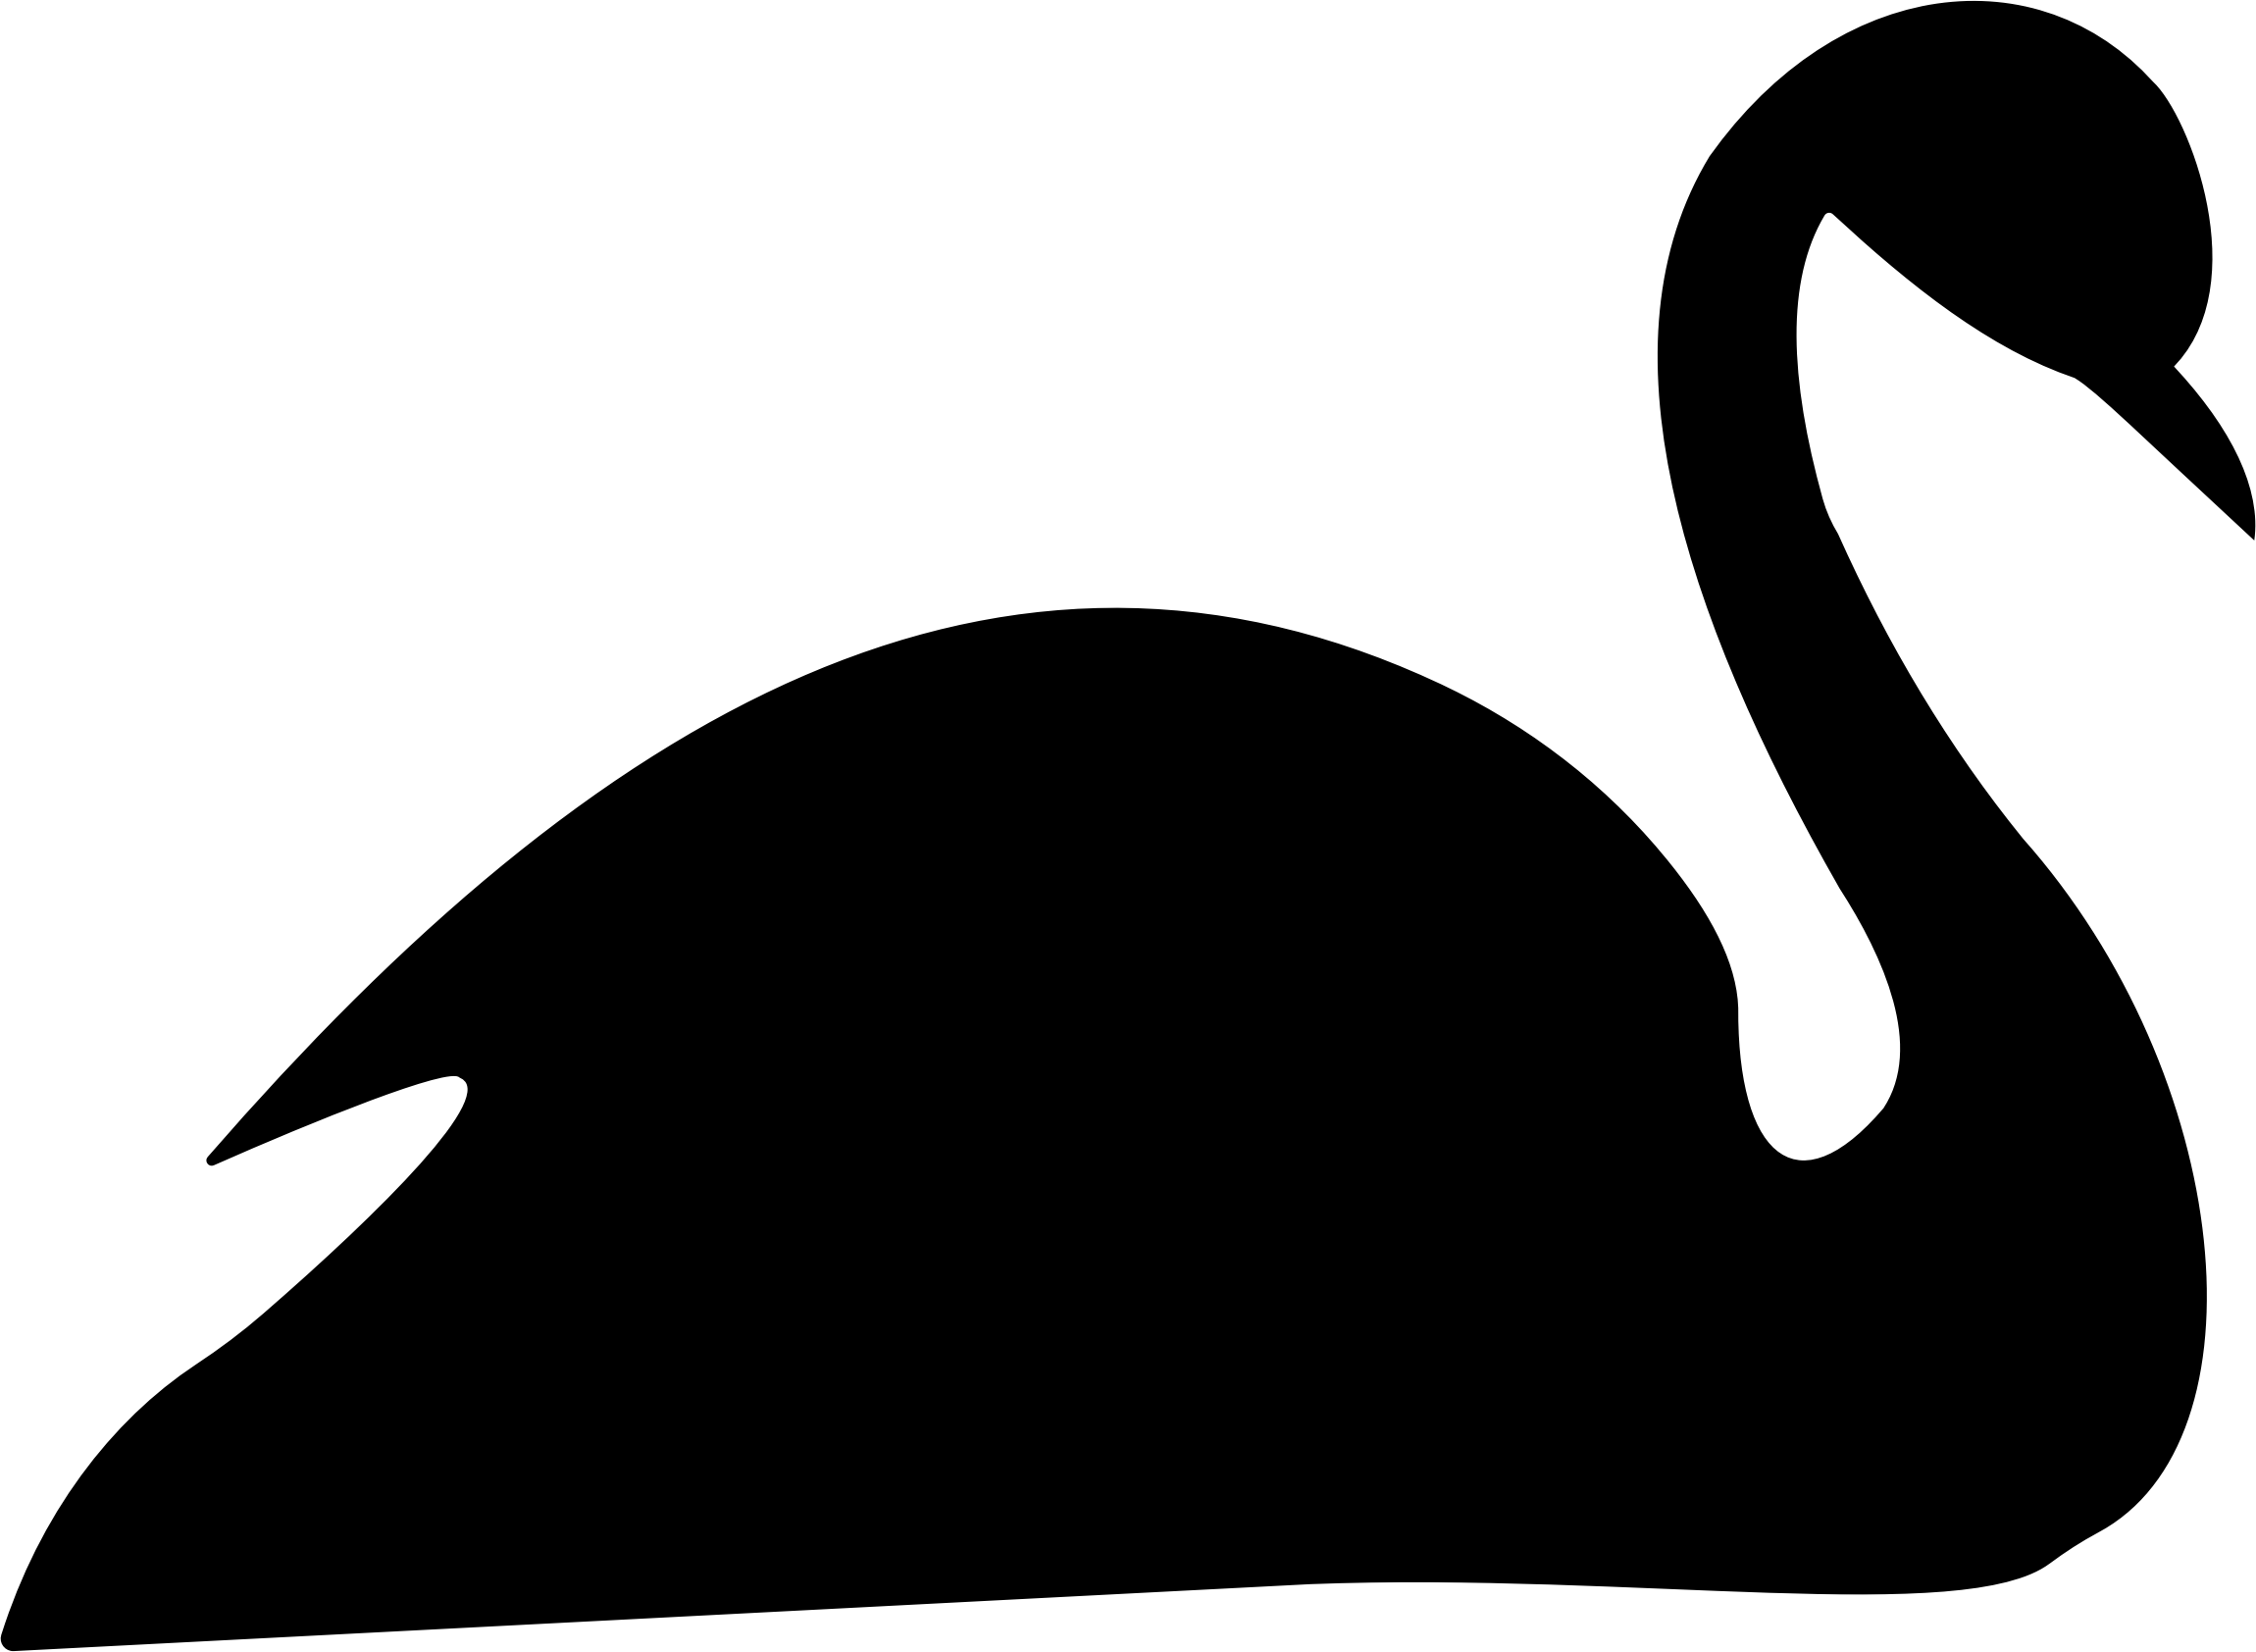 2300x1684 Clipart